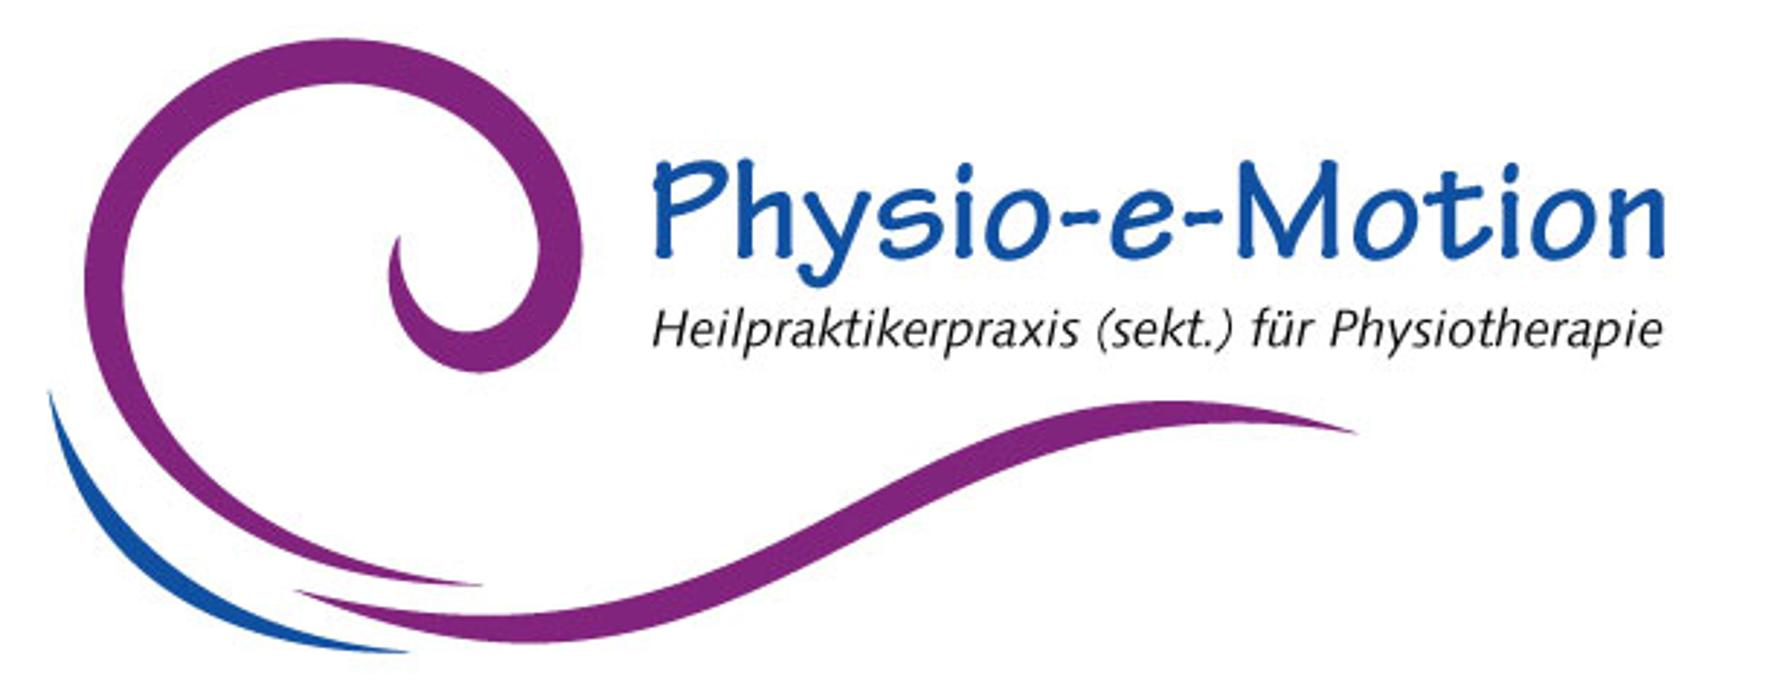 Bild zu Physio-e-Motion in Melle